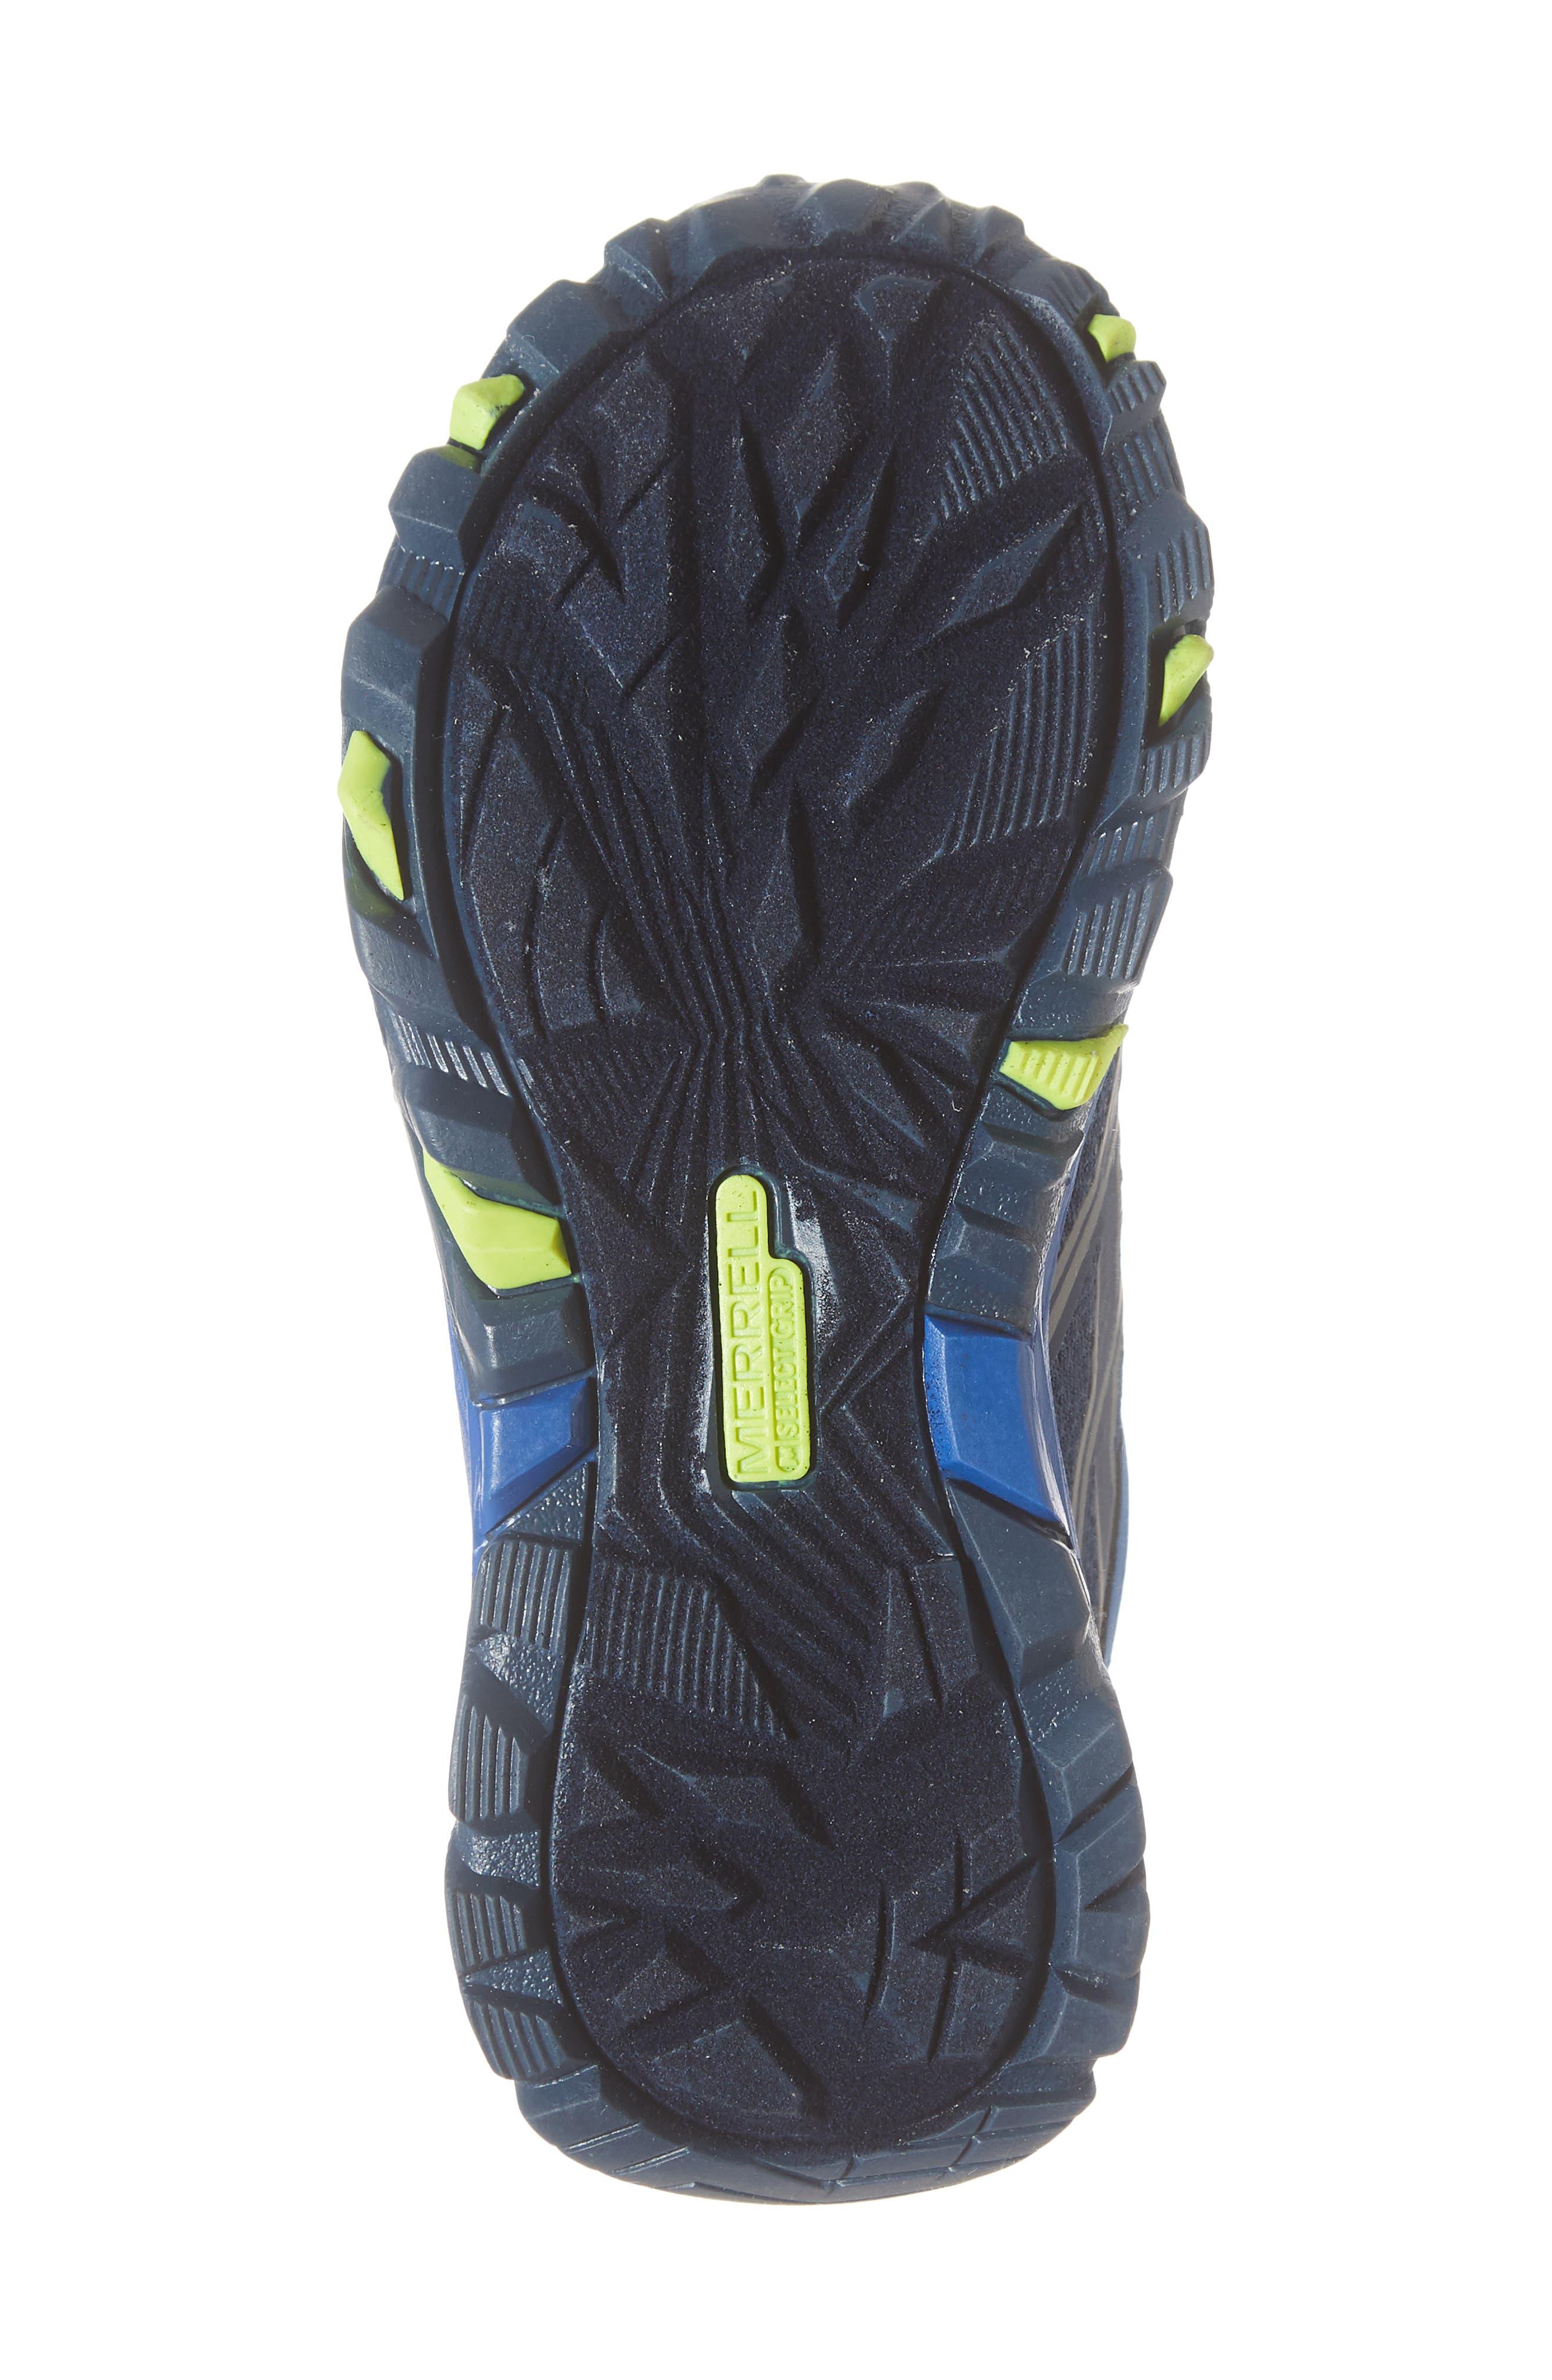 MERRELL, Moab FST Mid Top Waterproof Sneaker Boot, Alternate thumbnail 6, color, NAVY/ COBALT